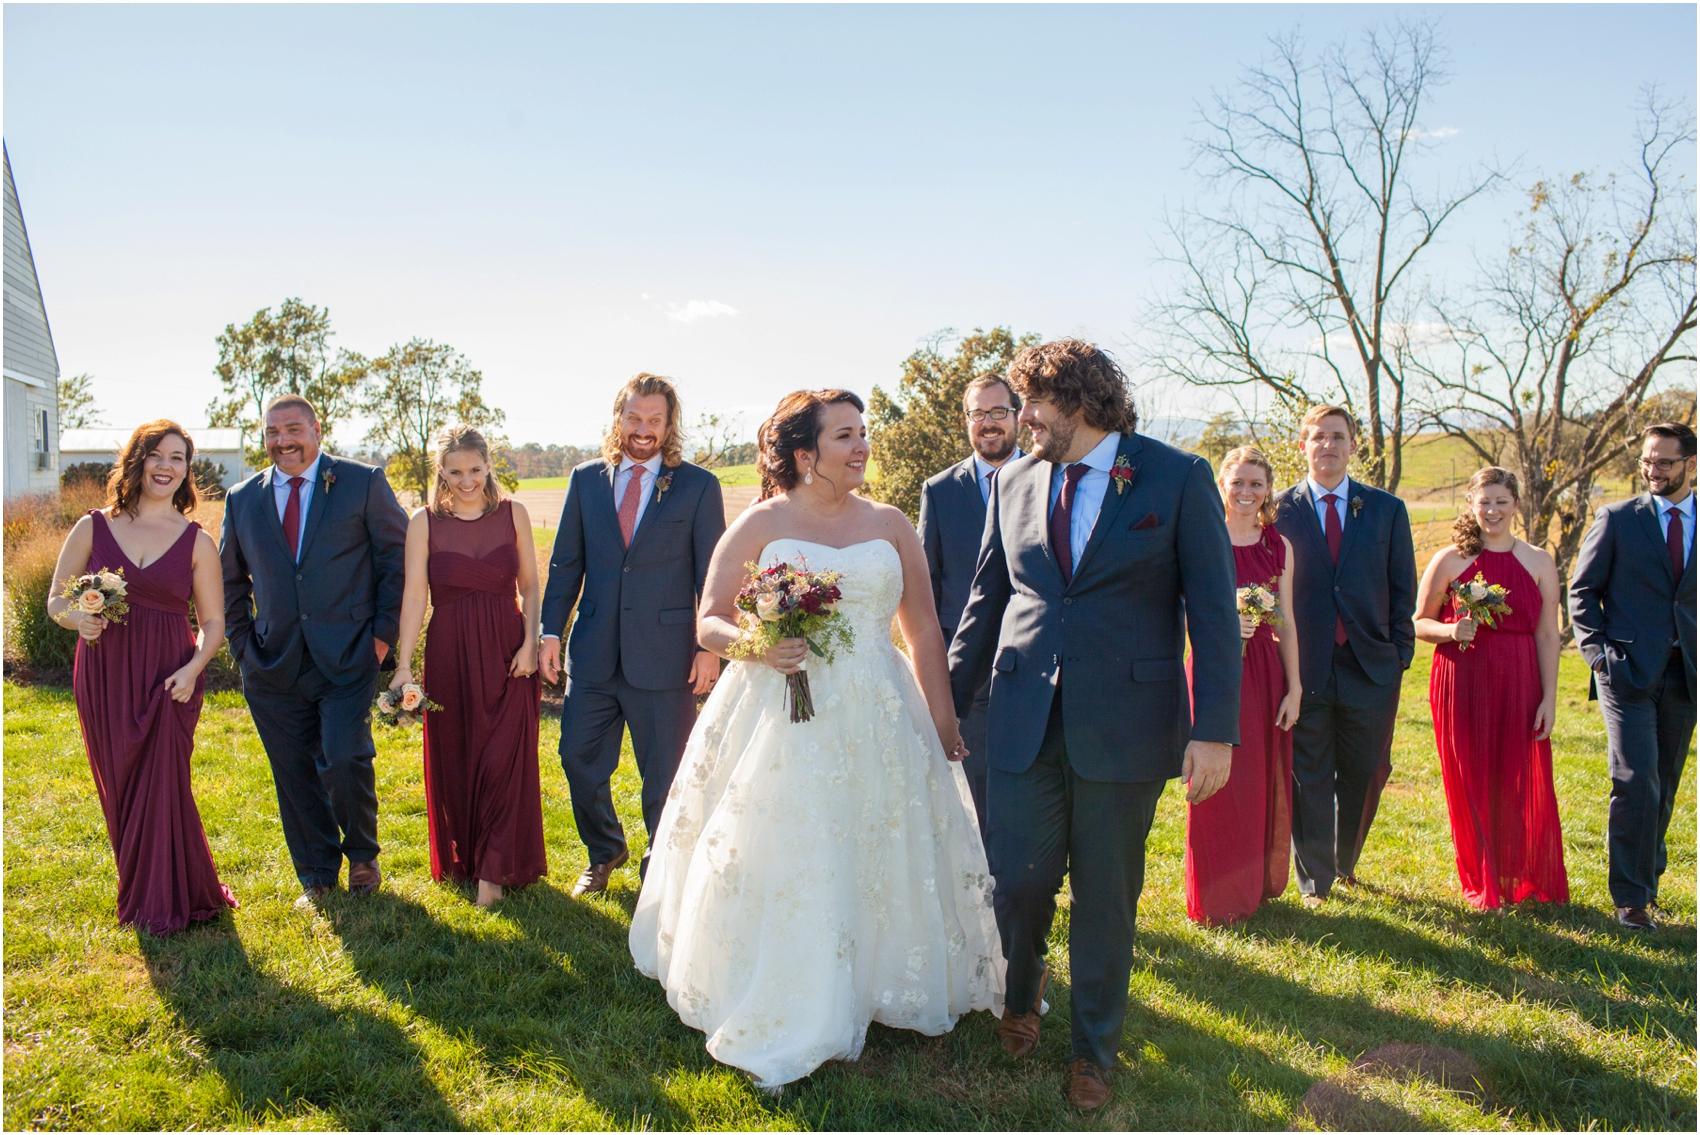 On-Sunny-Slope-Farm-Fall-Virginia-Wedding-2620.jpg